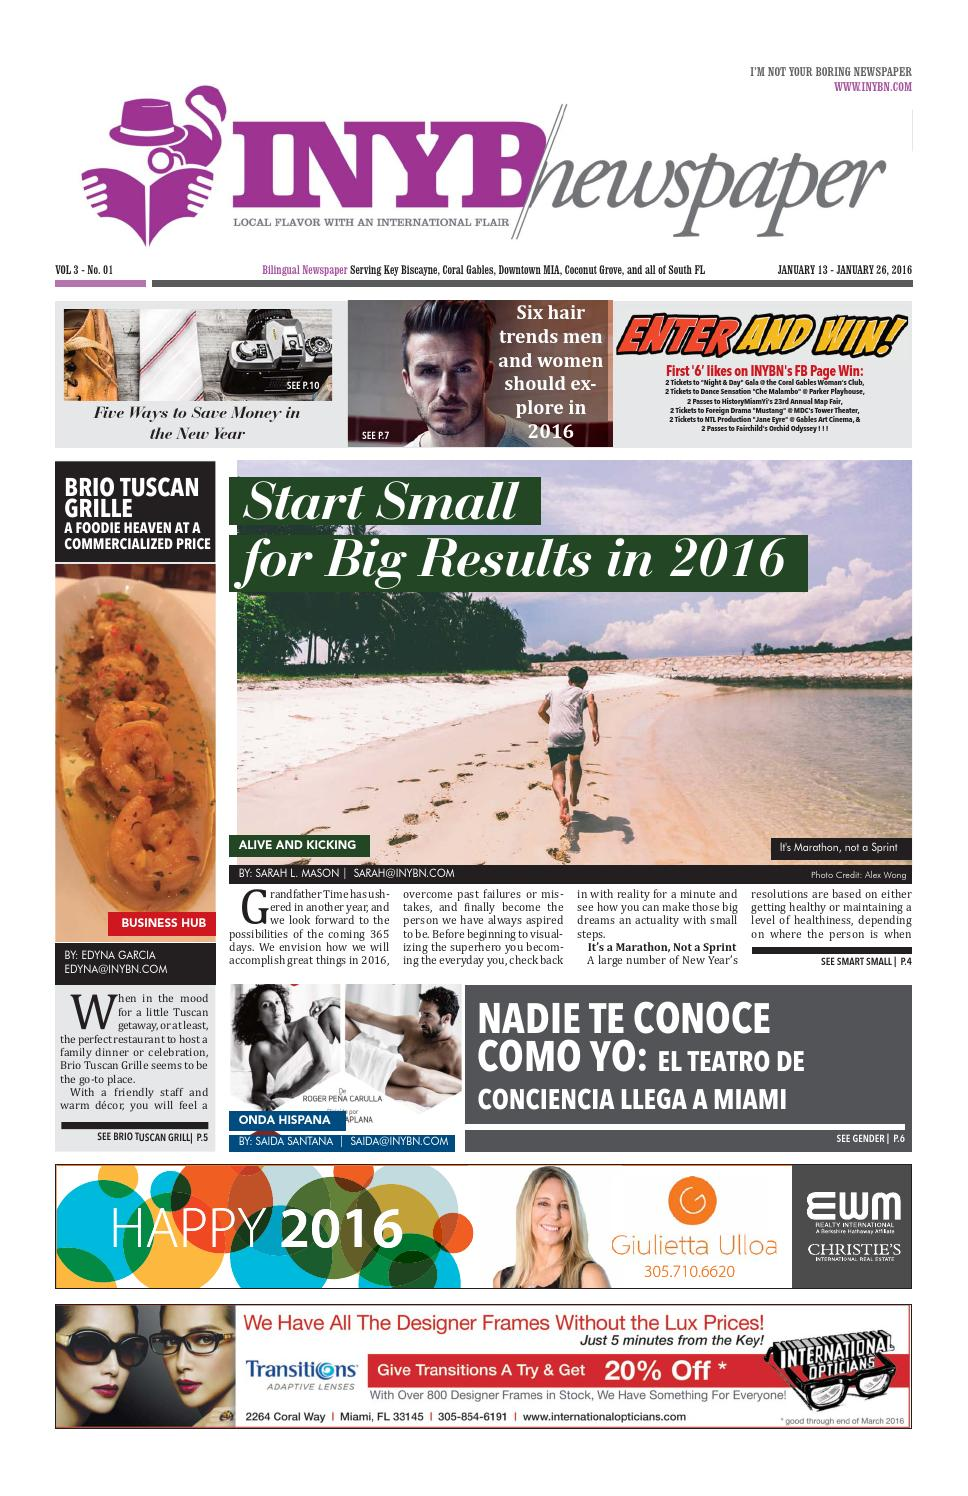 821e4f164a INYB  Newspaper - Vol. 3 Edition 1 by INYBN - issuu